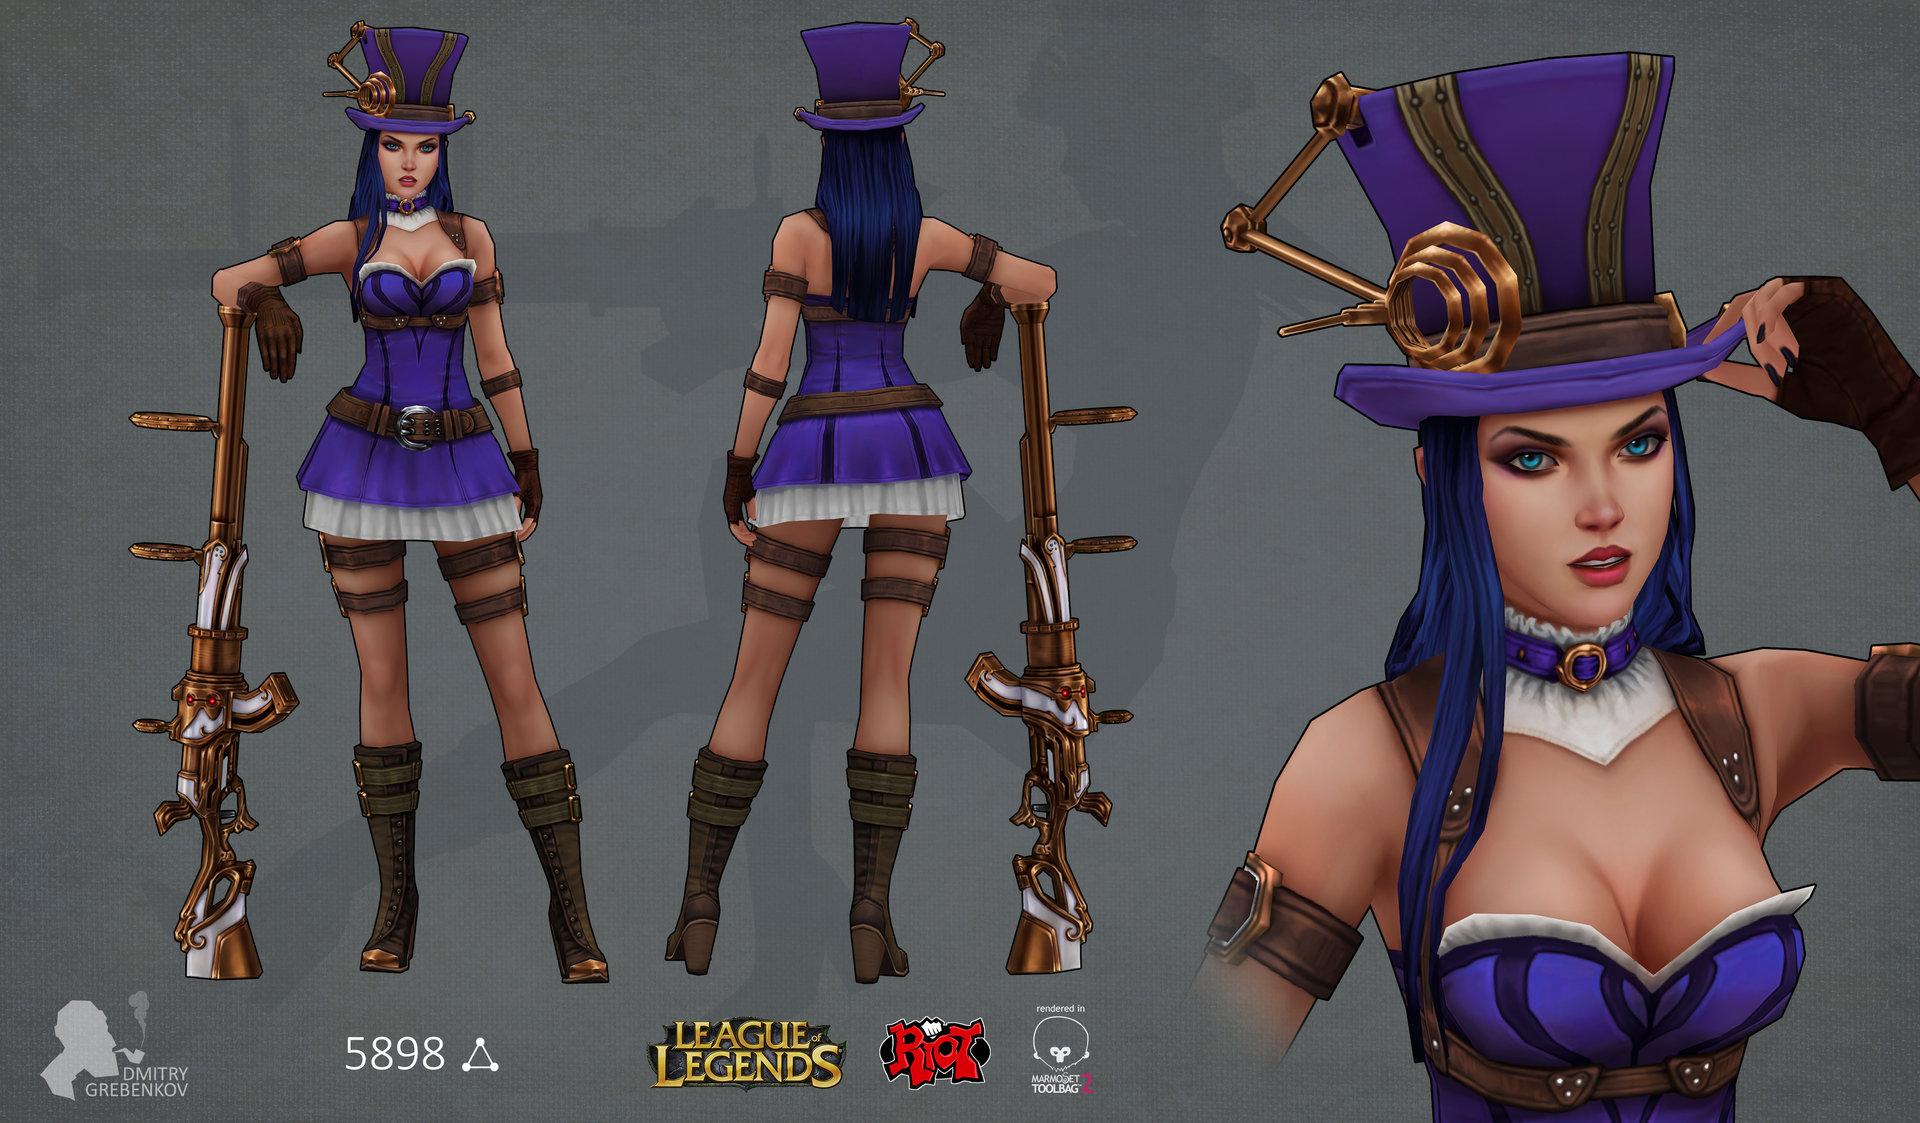 League Of Legends Character Design Contest : Artstation riot art contest caitlyn dmitry grebenkov